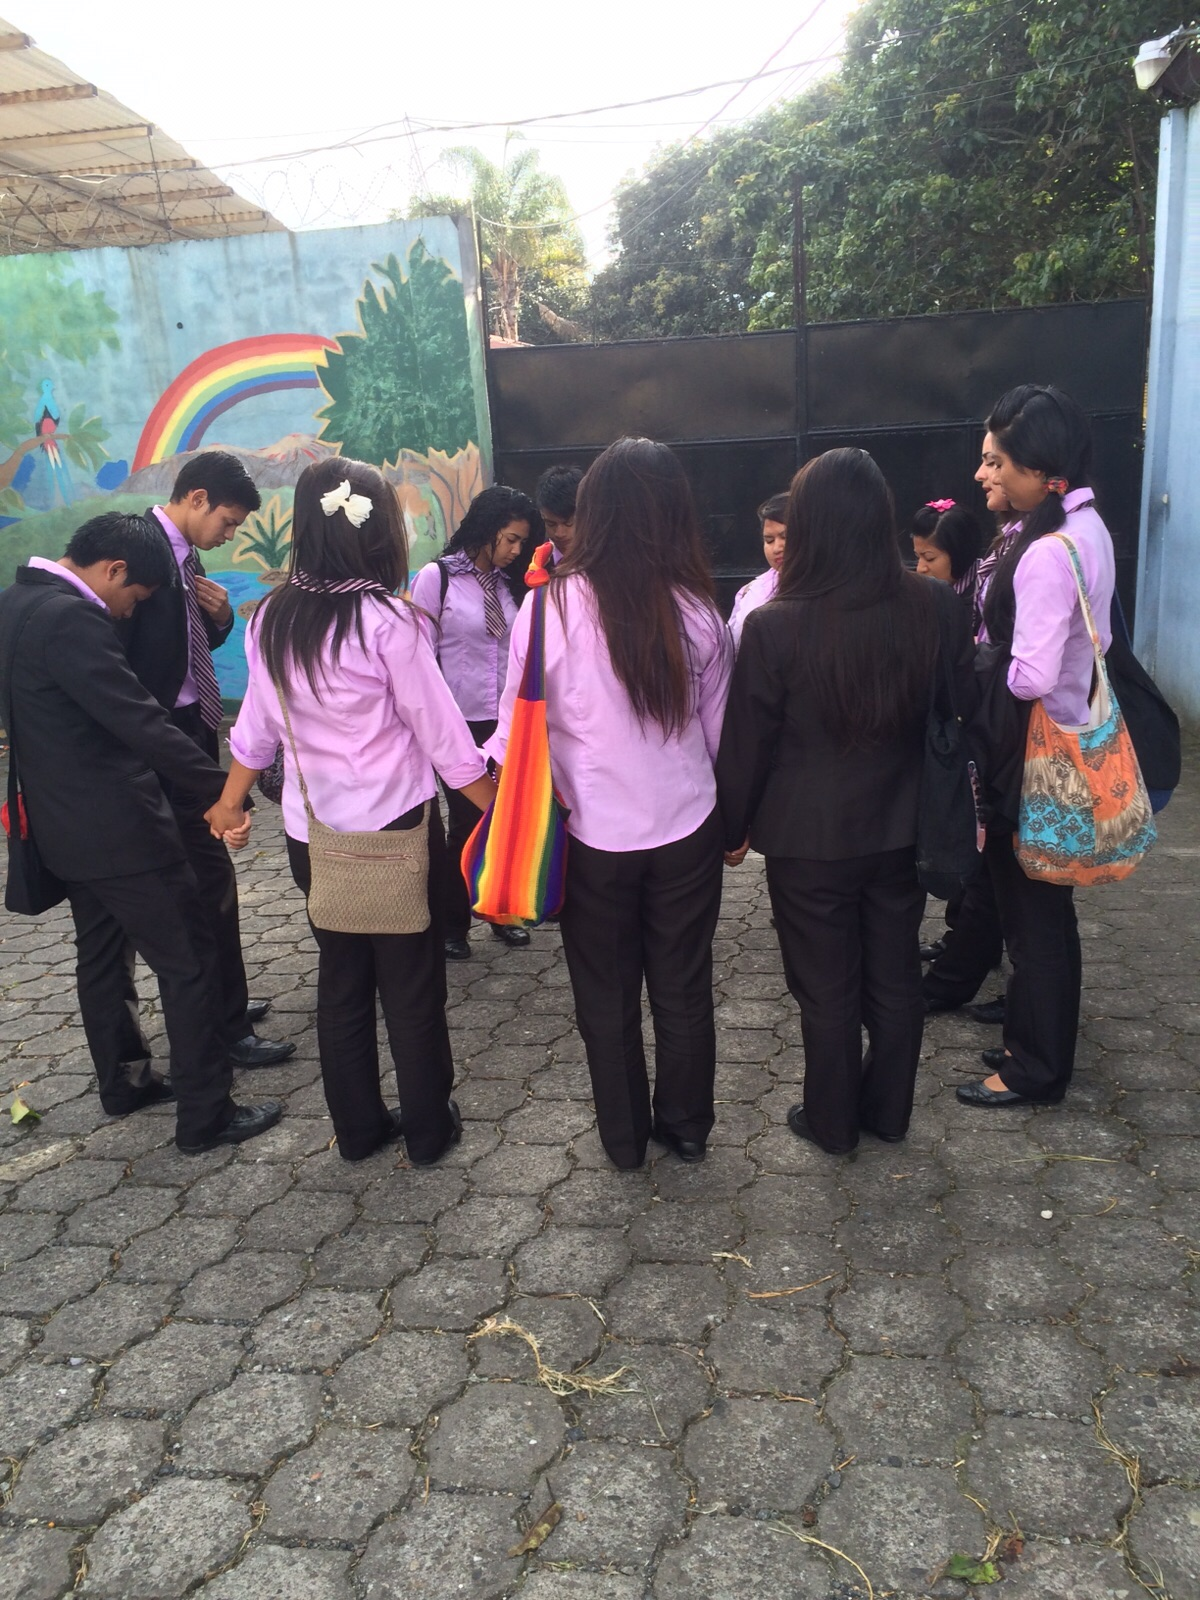 The seniors praying before going to work